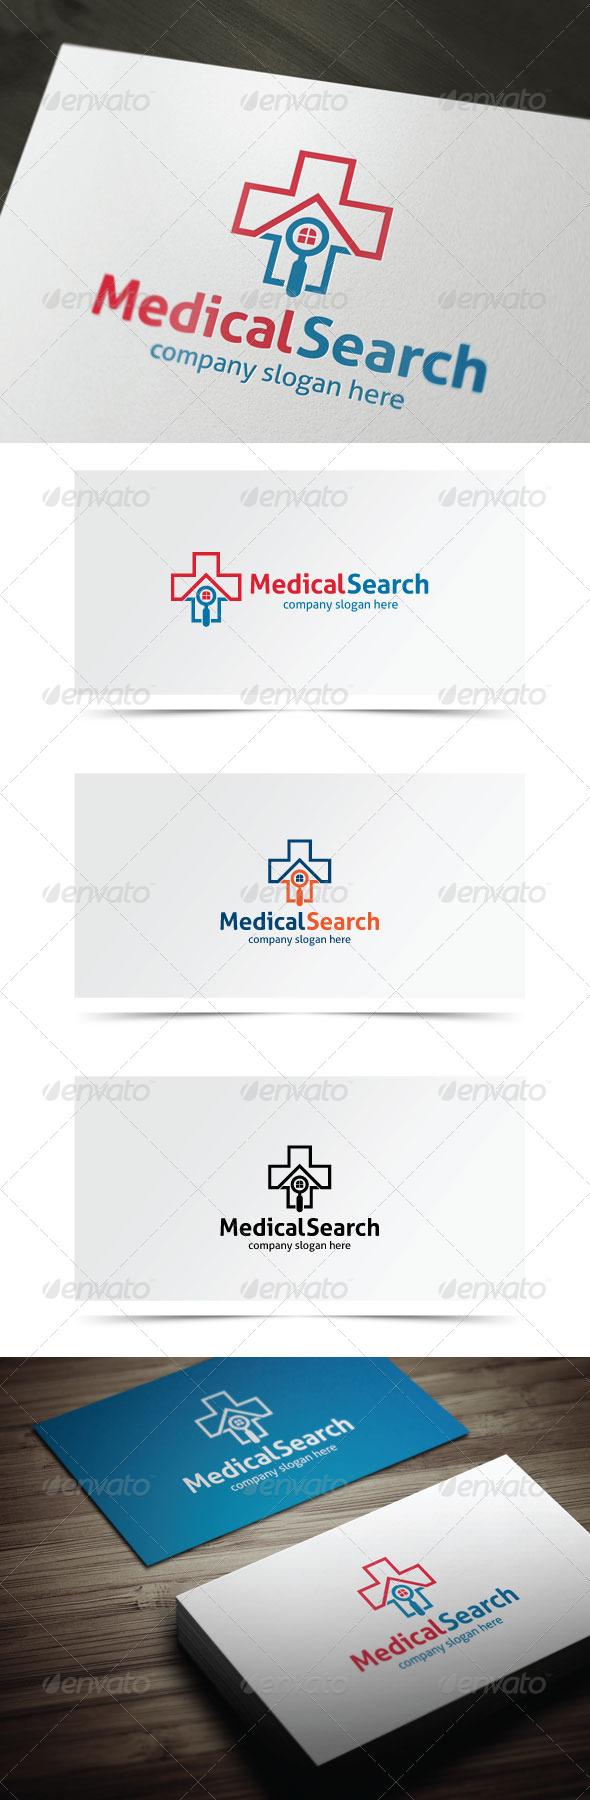 GraphicRiver Medical Search 7151663